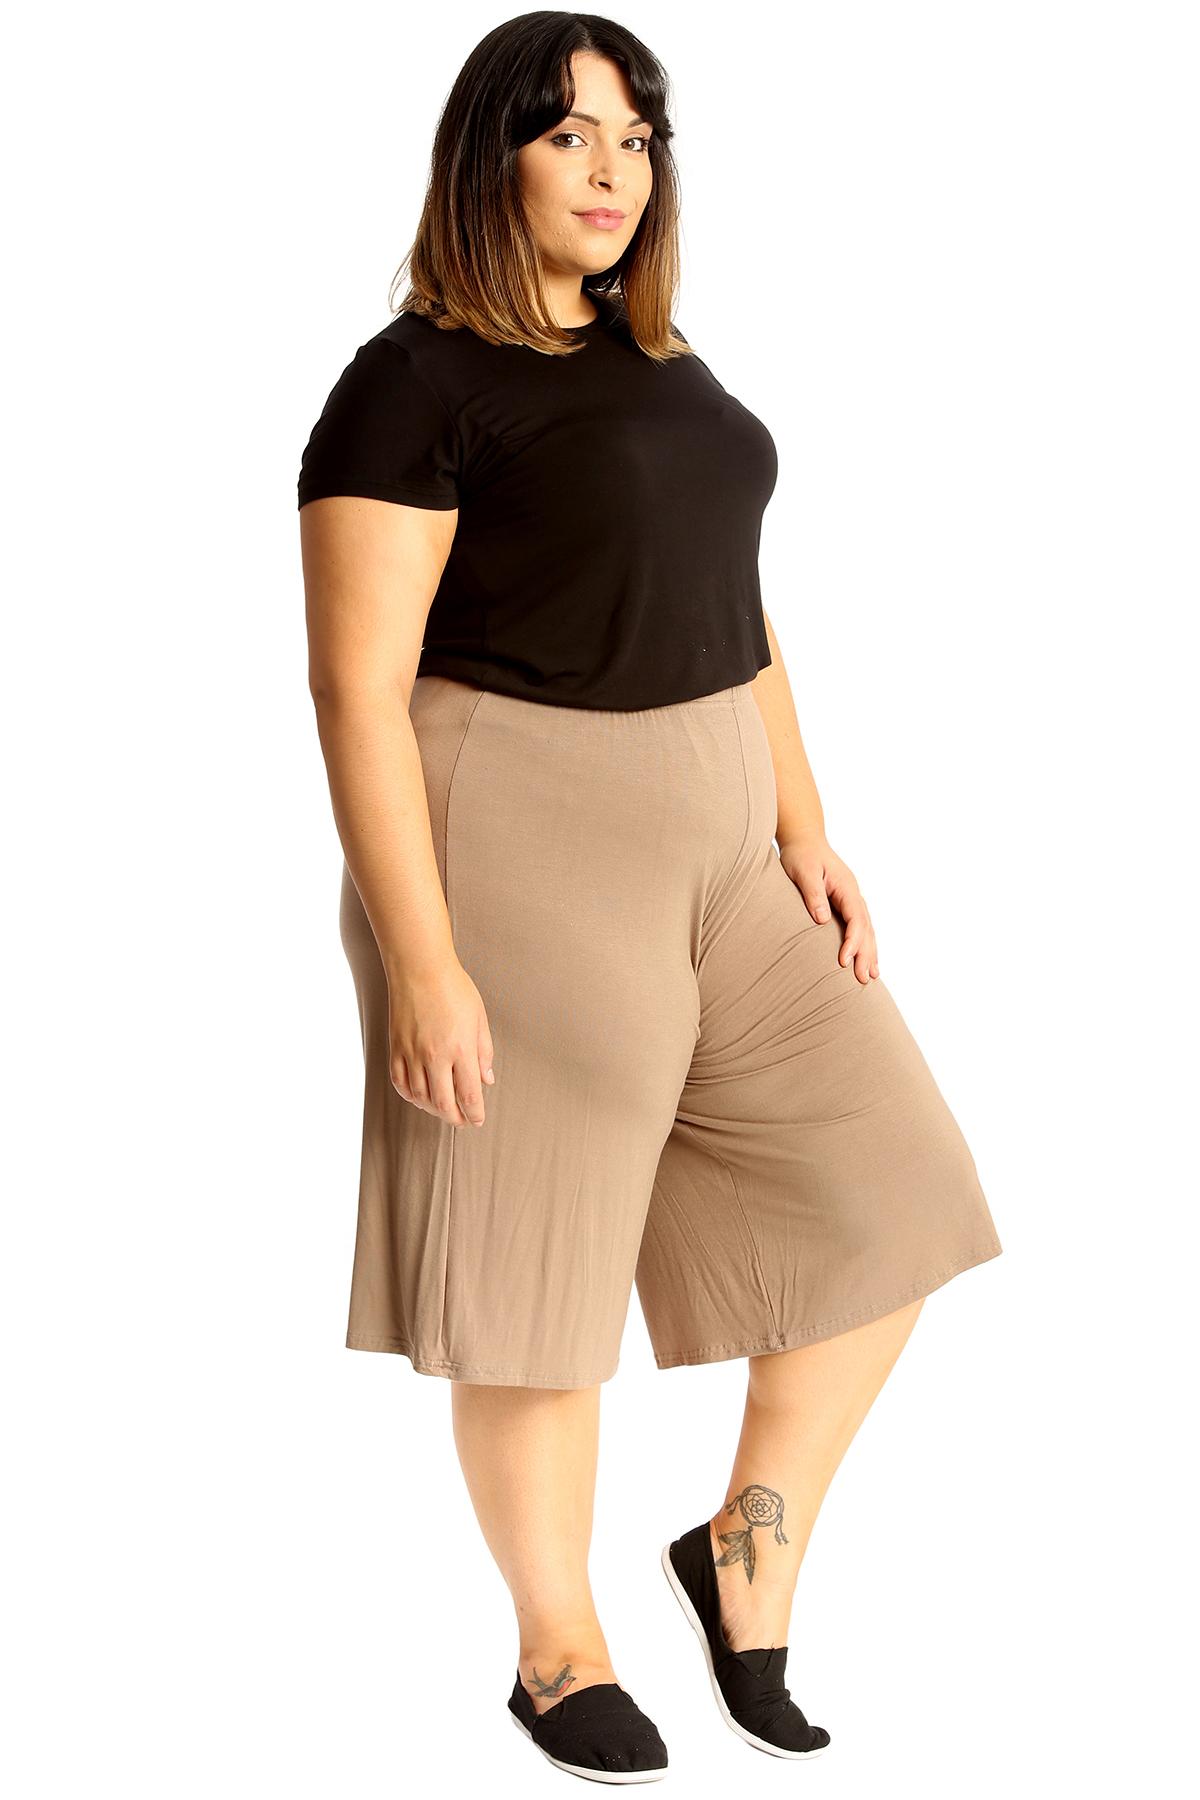 New-Womens-Plus-Size-Culottes-Ladies-Plain-Shorts-Palazzo-Elastic-Pants-Summer thumbnail 27